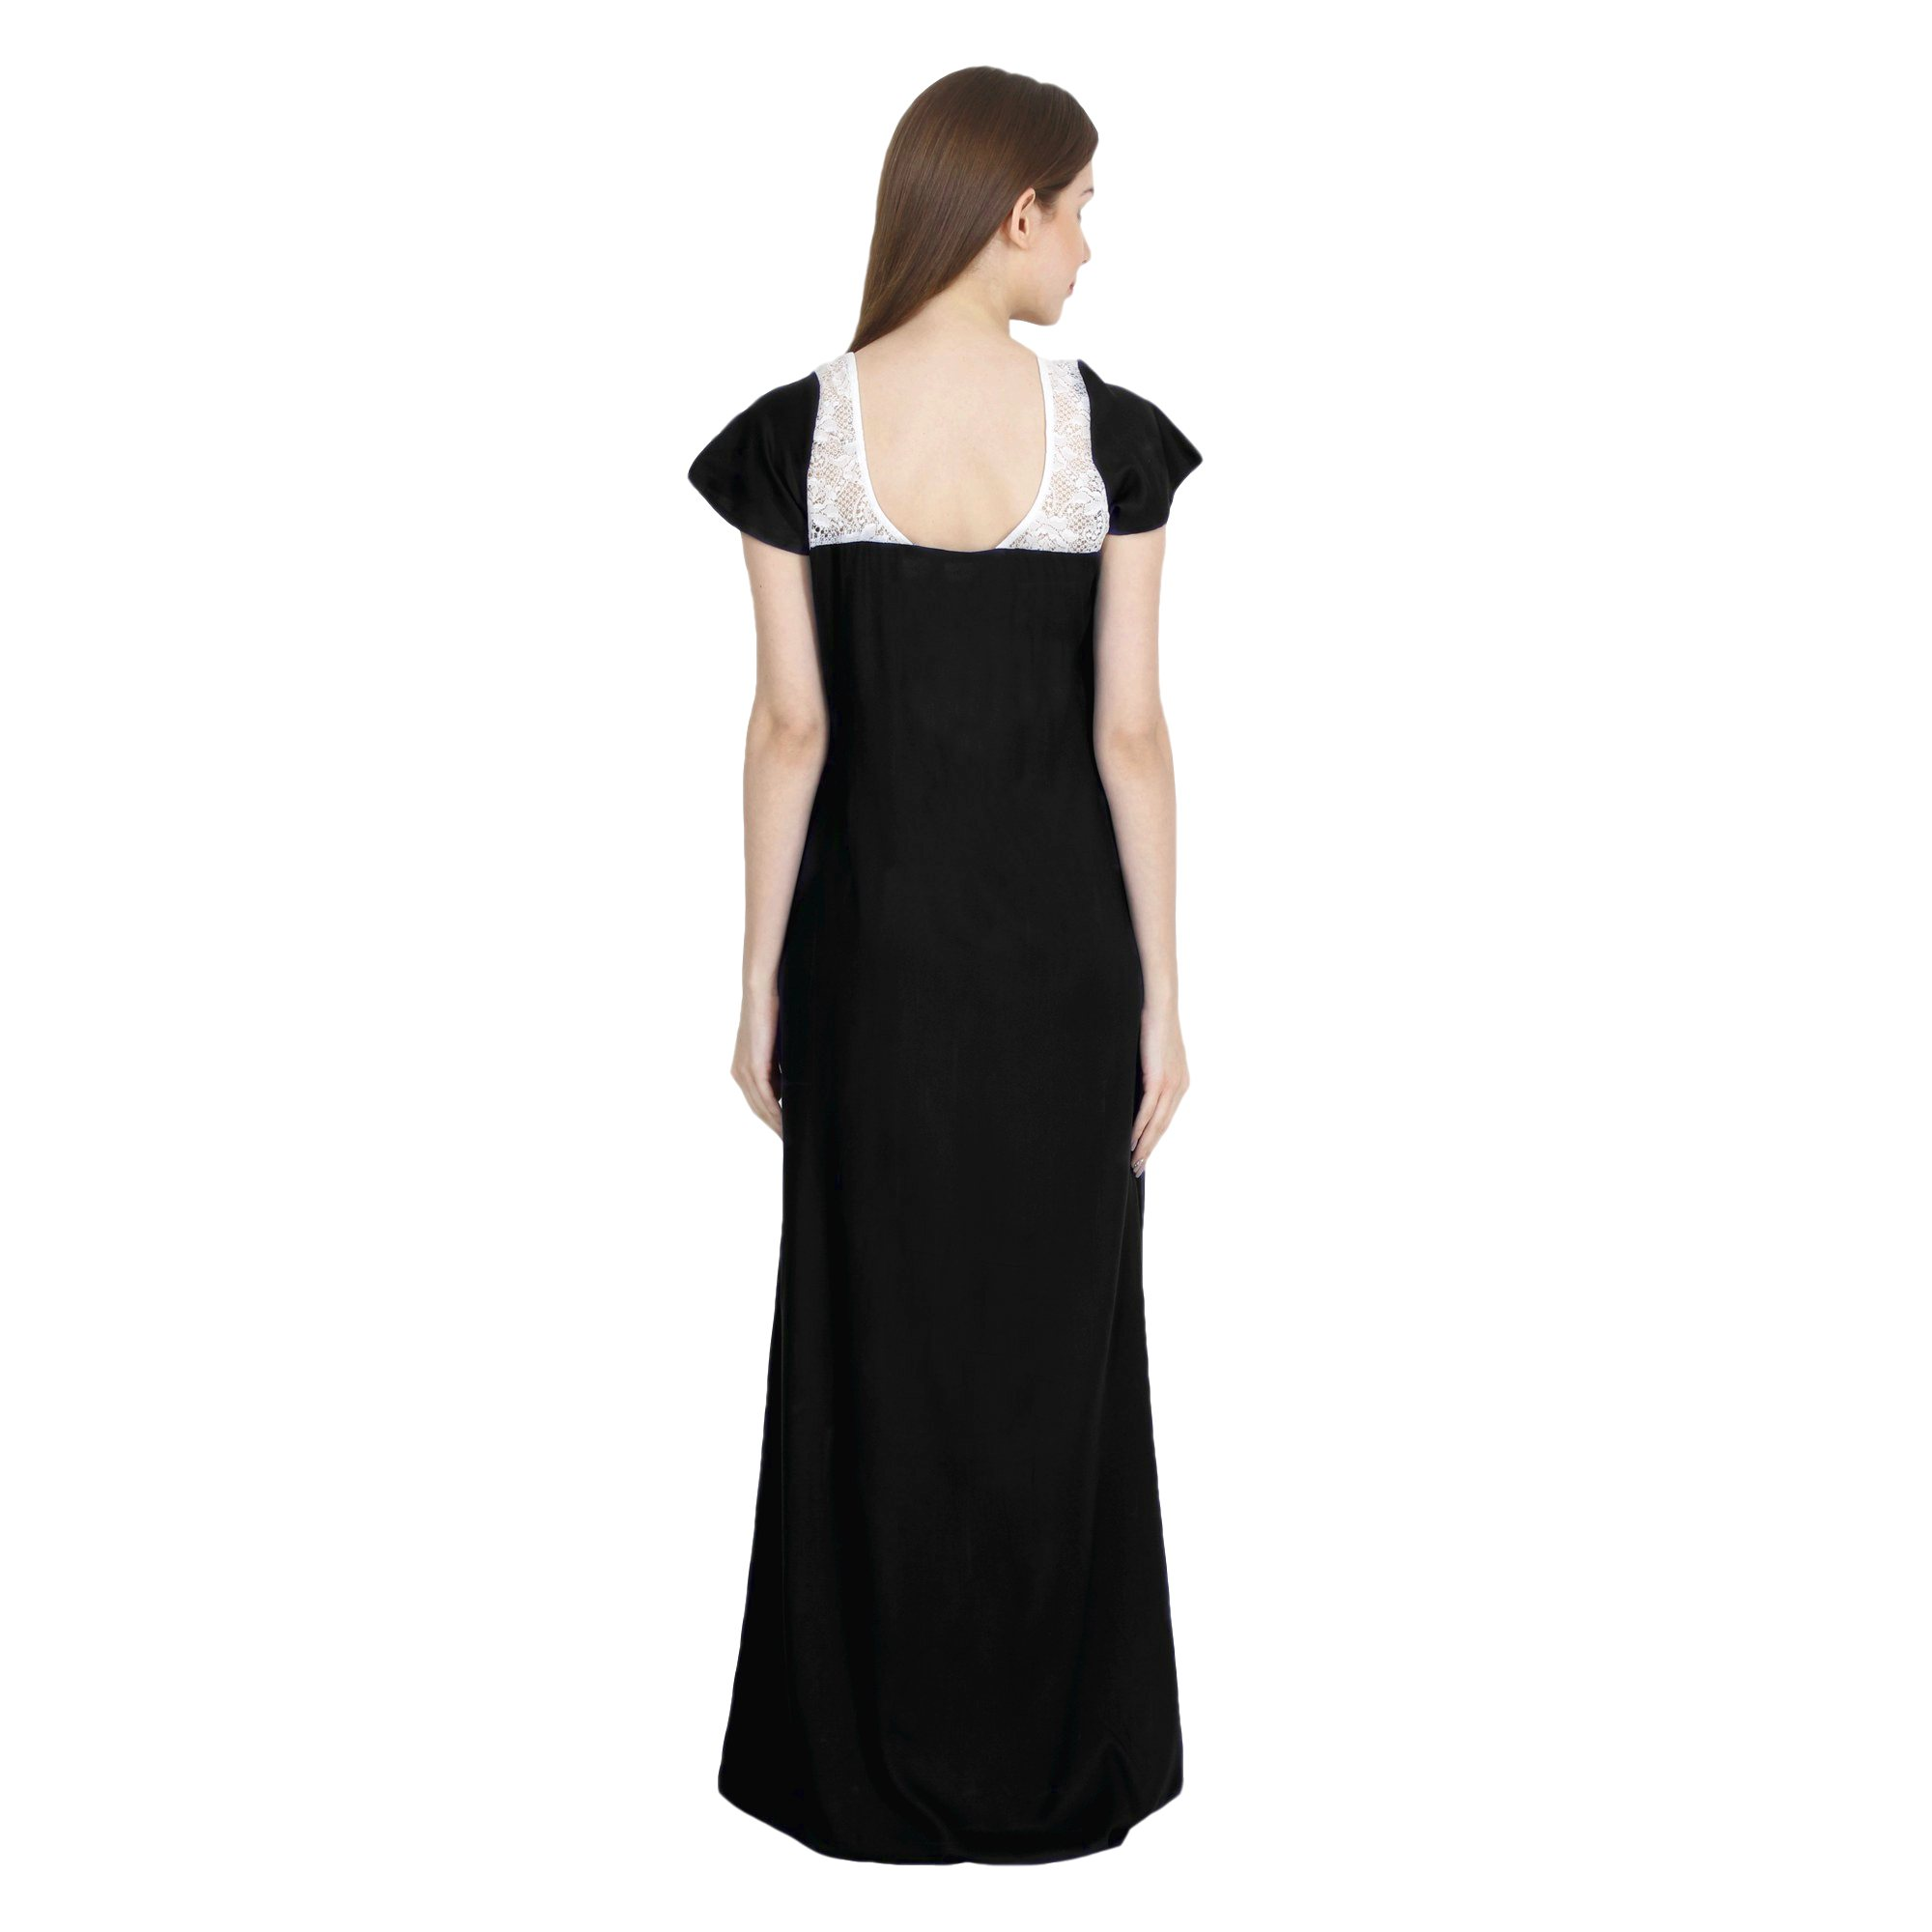 Lace Bodice Cap Sleeve Maxi Length Nighty in Black